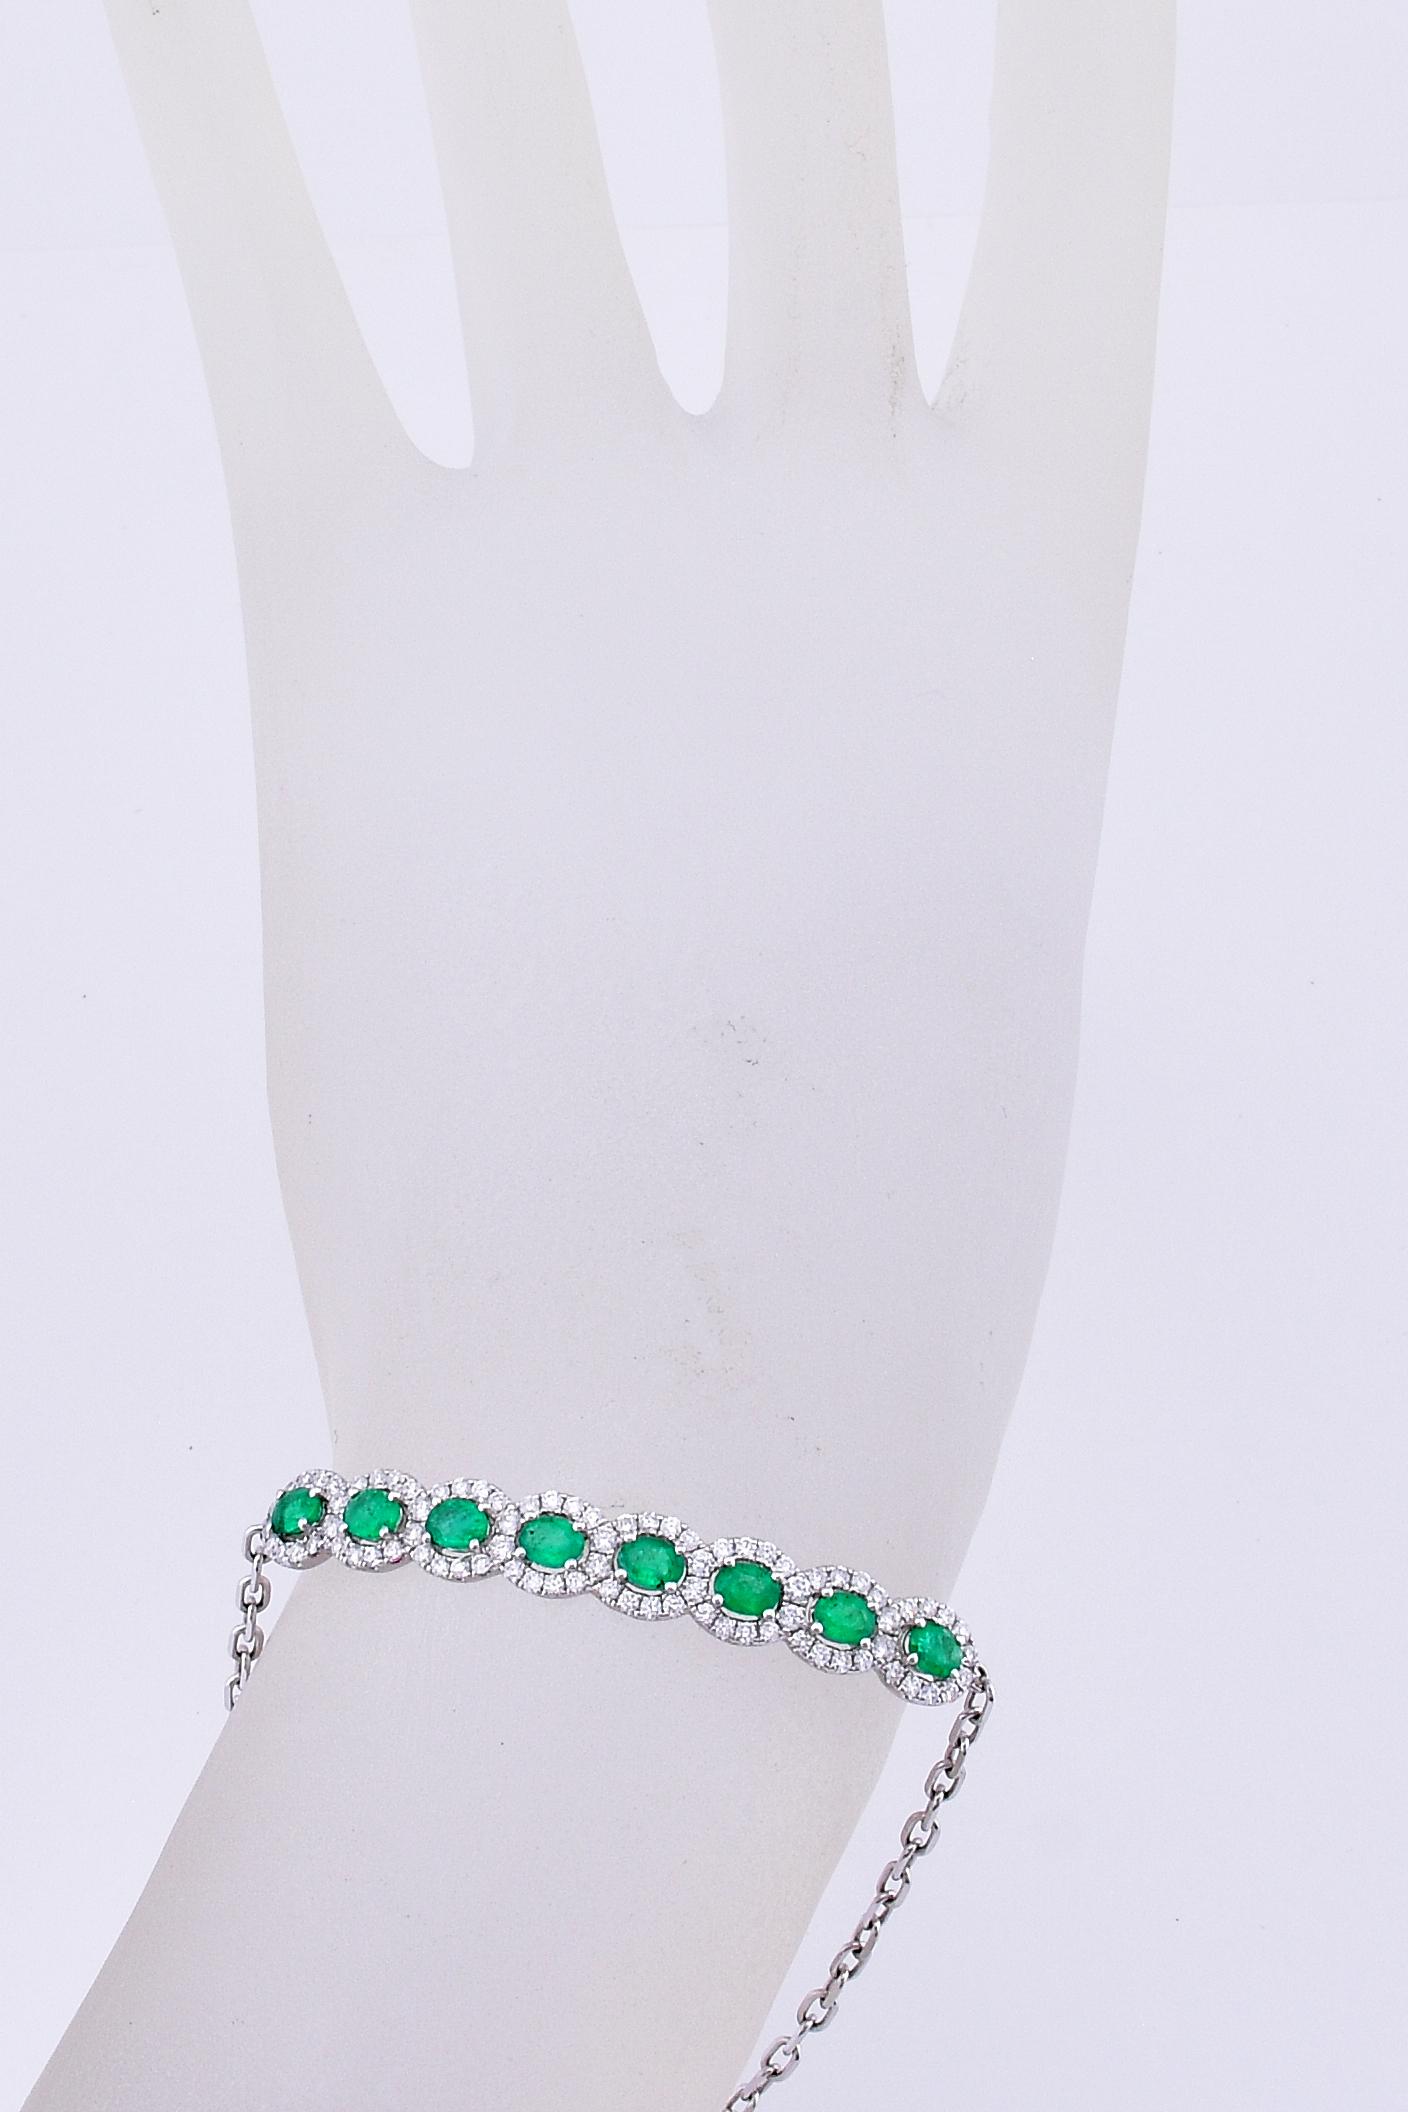 Almost 1 Carat Total Weight Emerald Slip On Bracelet